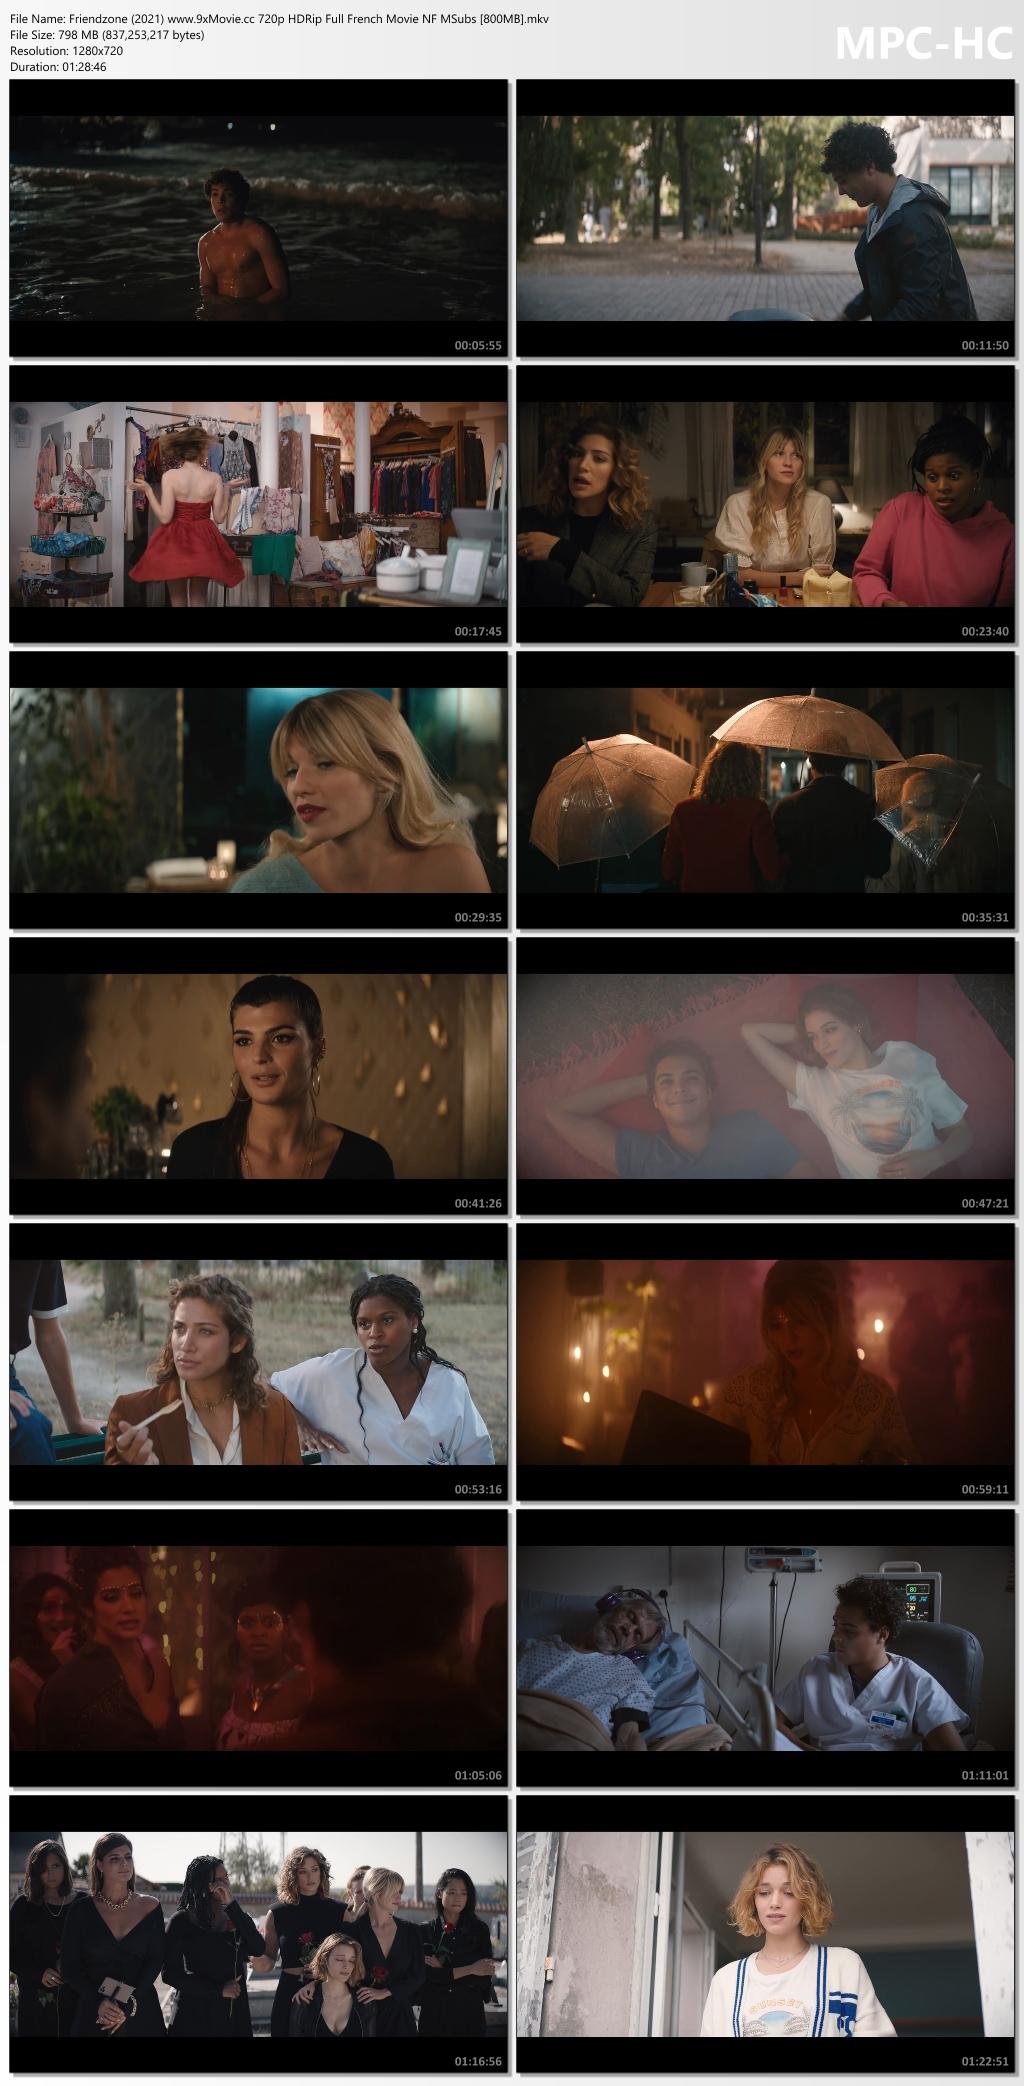 Friendzone-2021-www-9x-Movie-cc-720p-HDRip-Full-French-Movie-NF-MSubs-800-MB-mkv